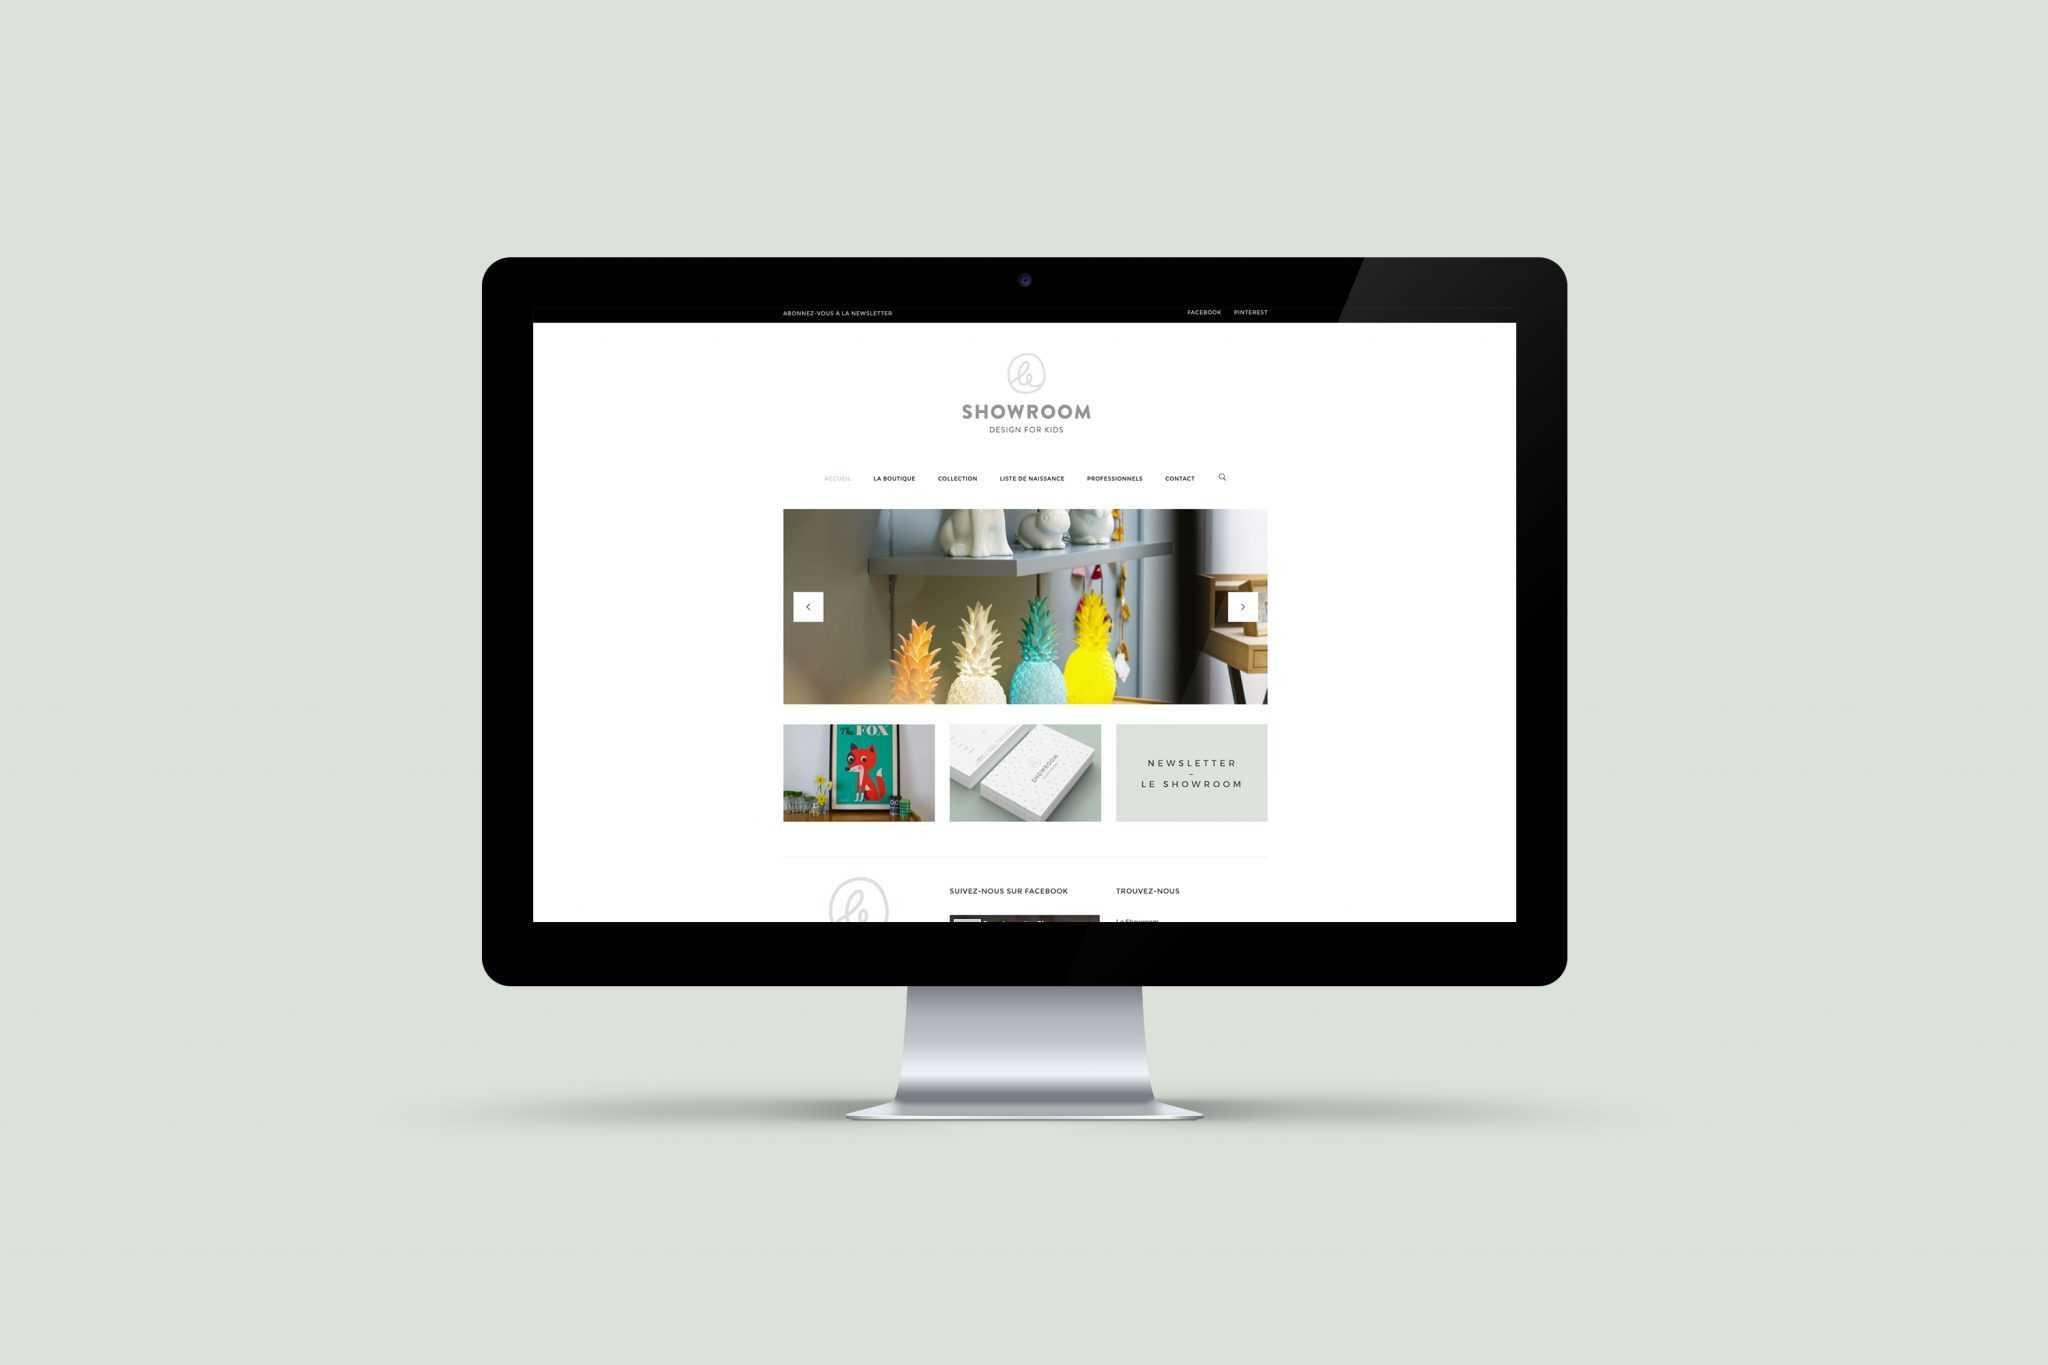 le-showroom-site-web-design